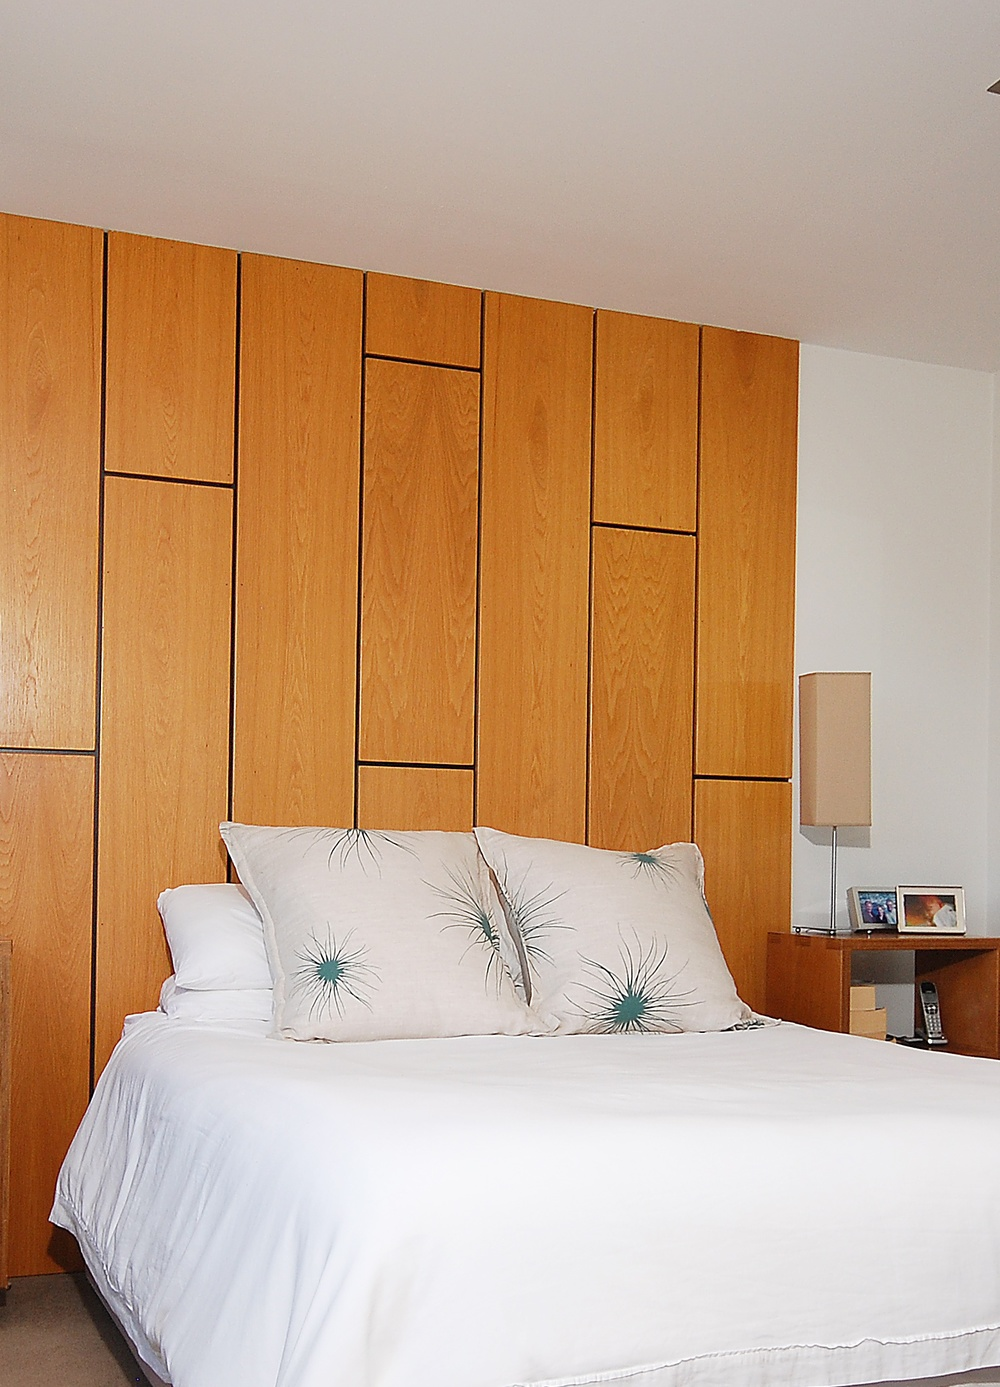 Plywood headboard by Mandel Contracting